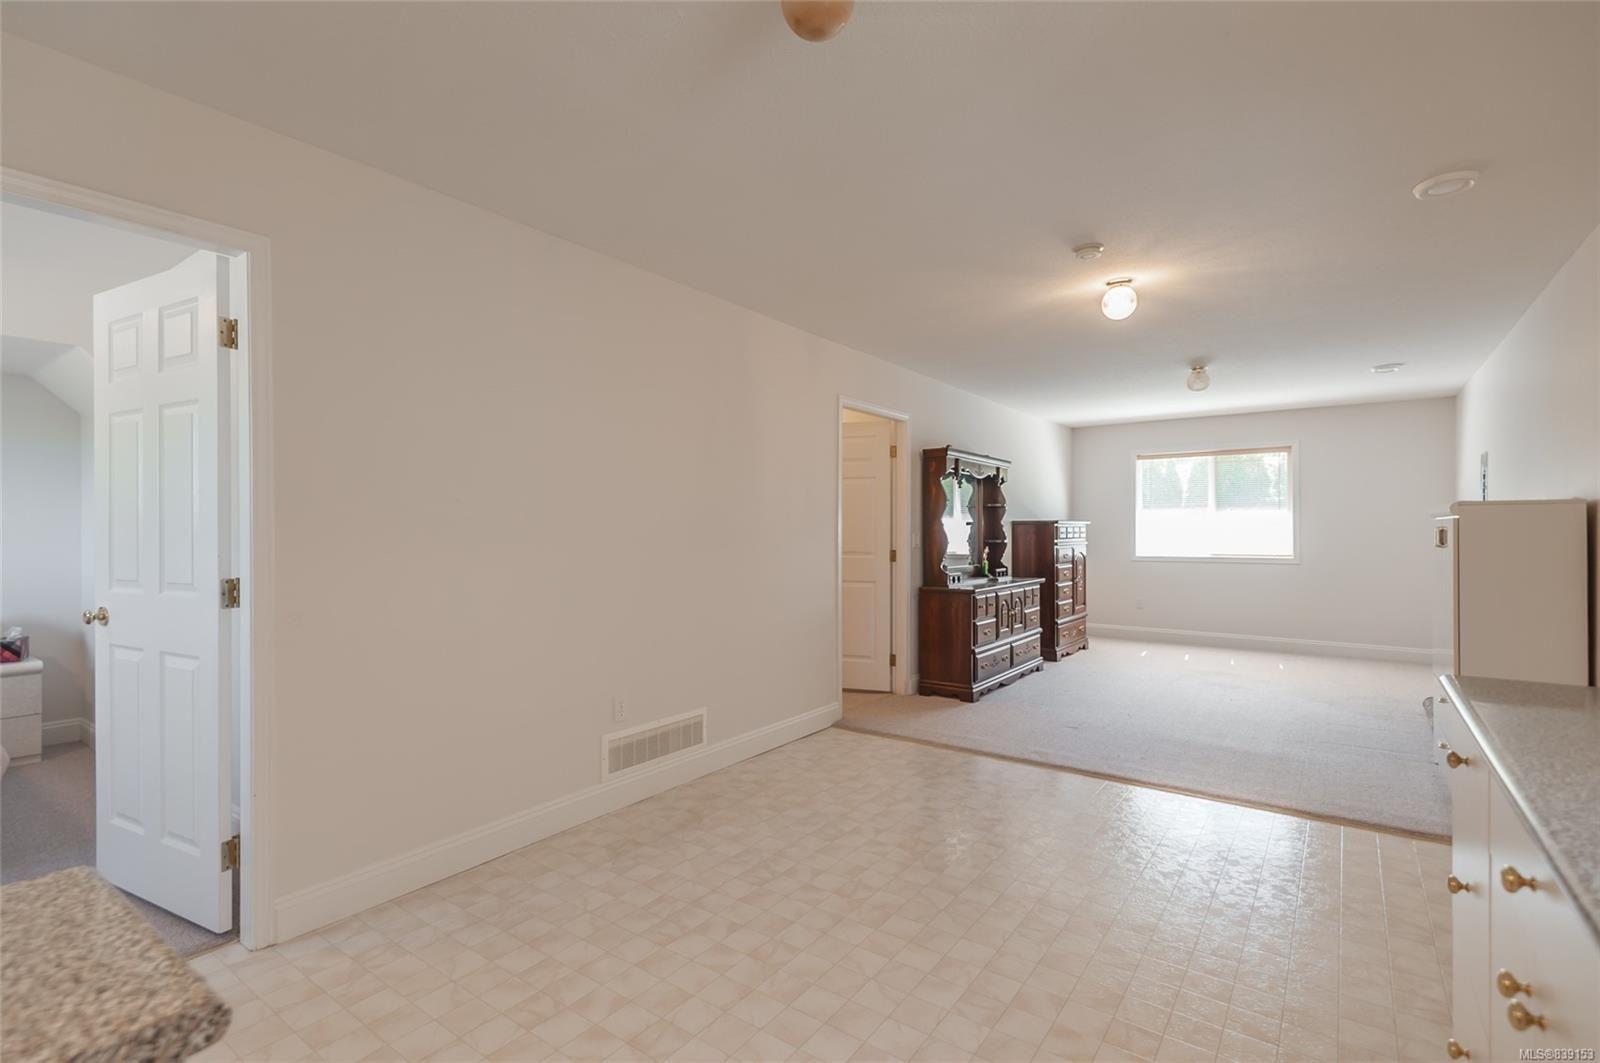 Photo 39: Photos: 6412 Dover Rd in NANAIMO: Na North Nanaimo House for sale (Nanaimo)  : MLS®# 839153